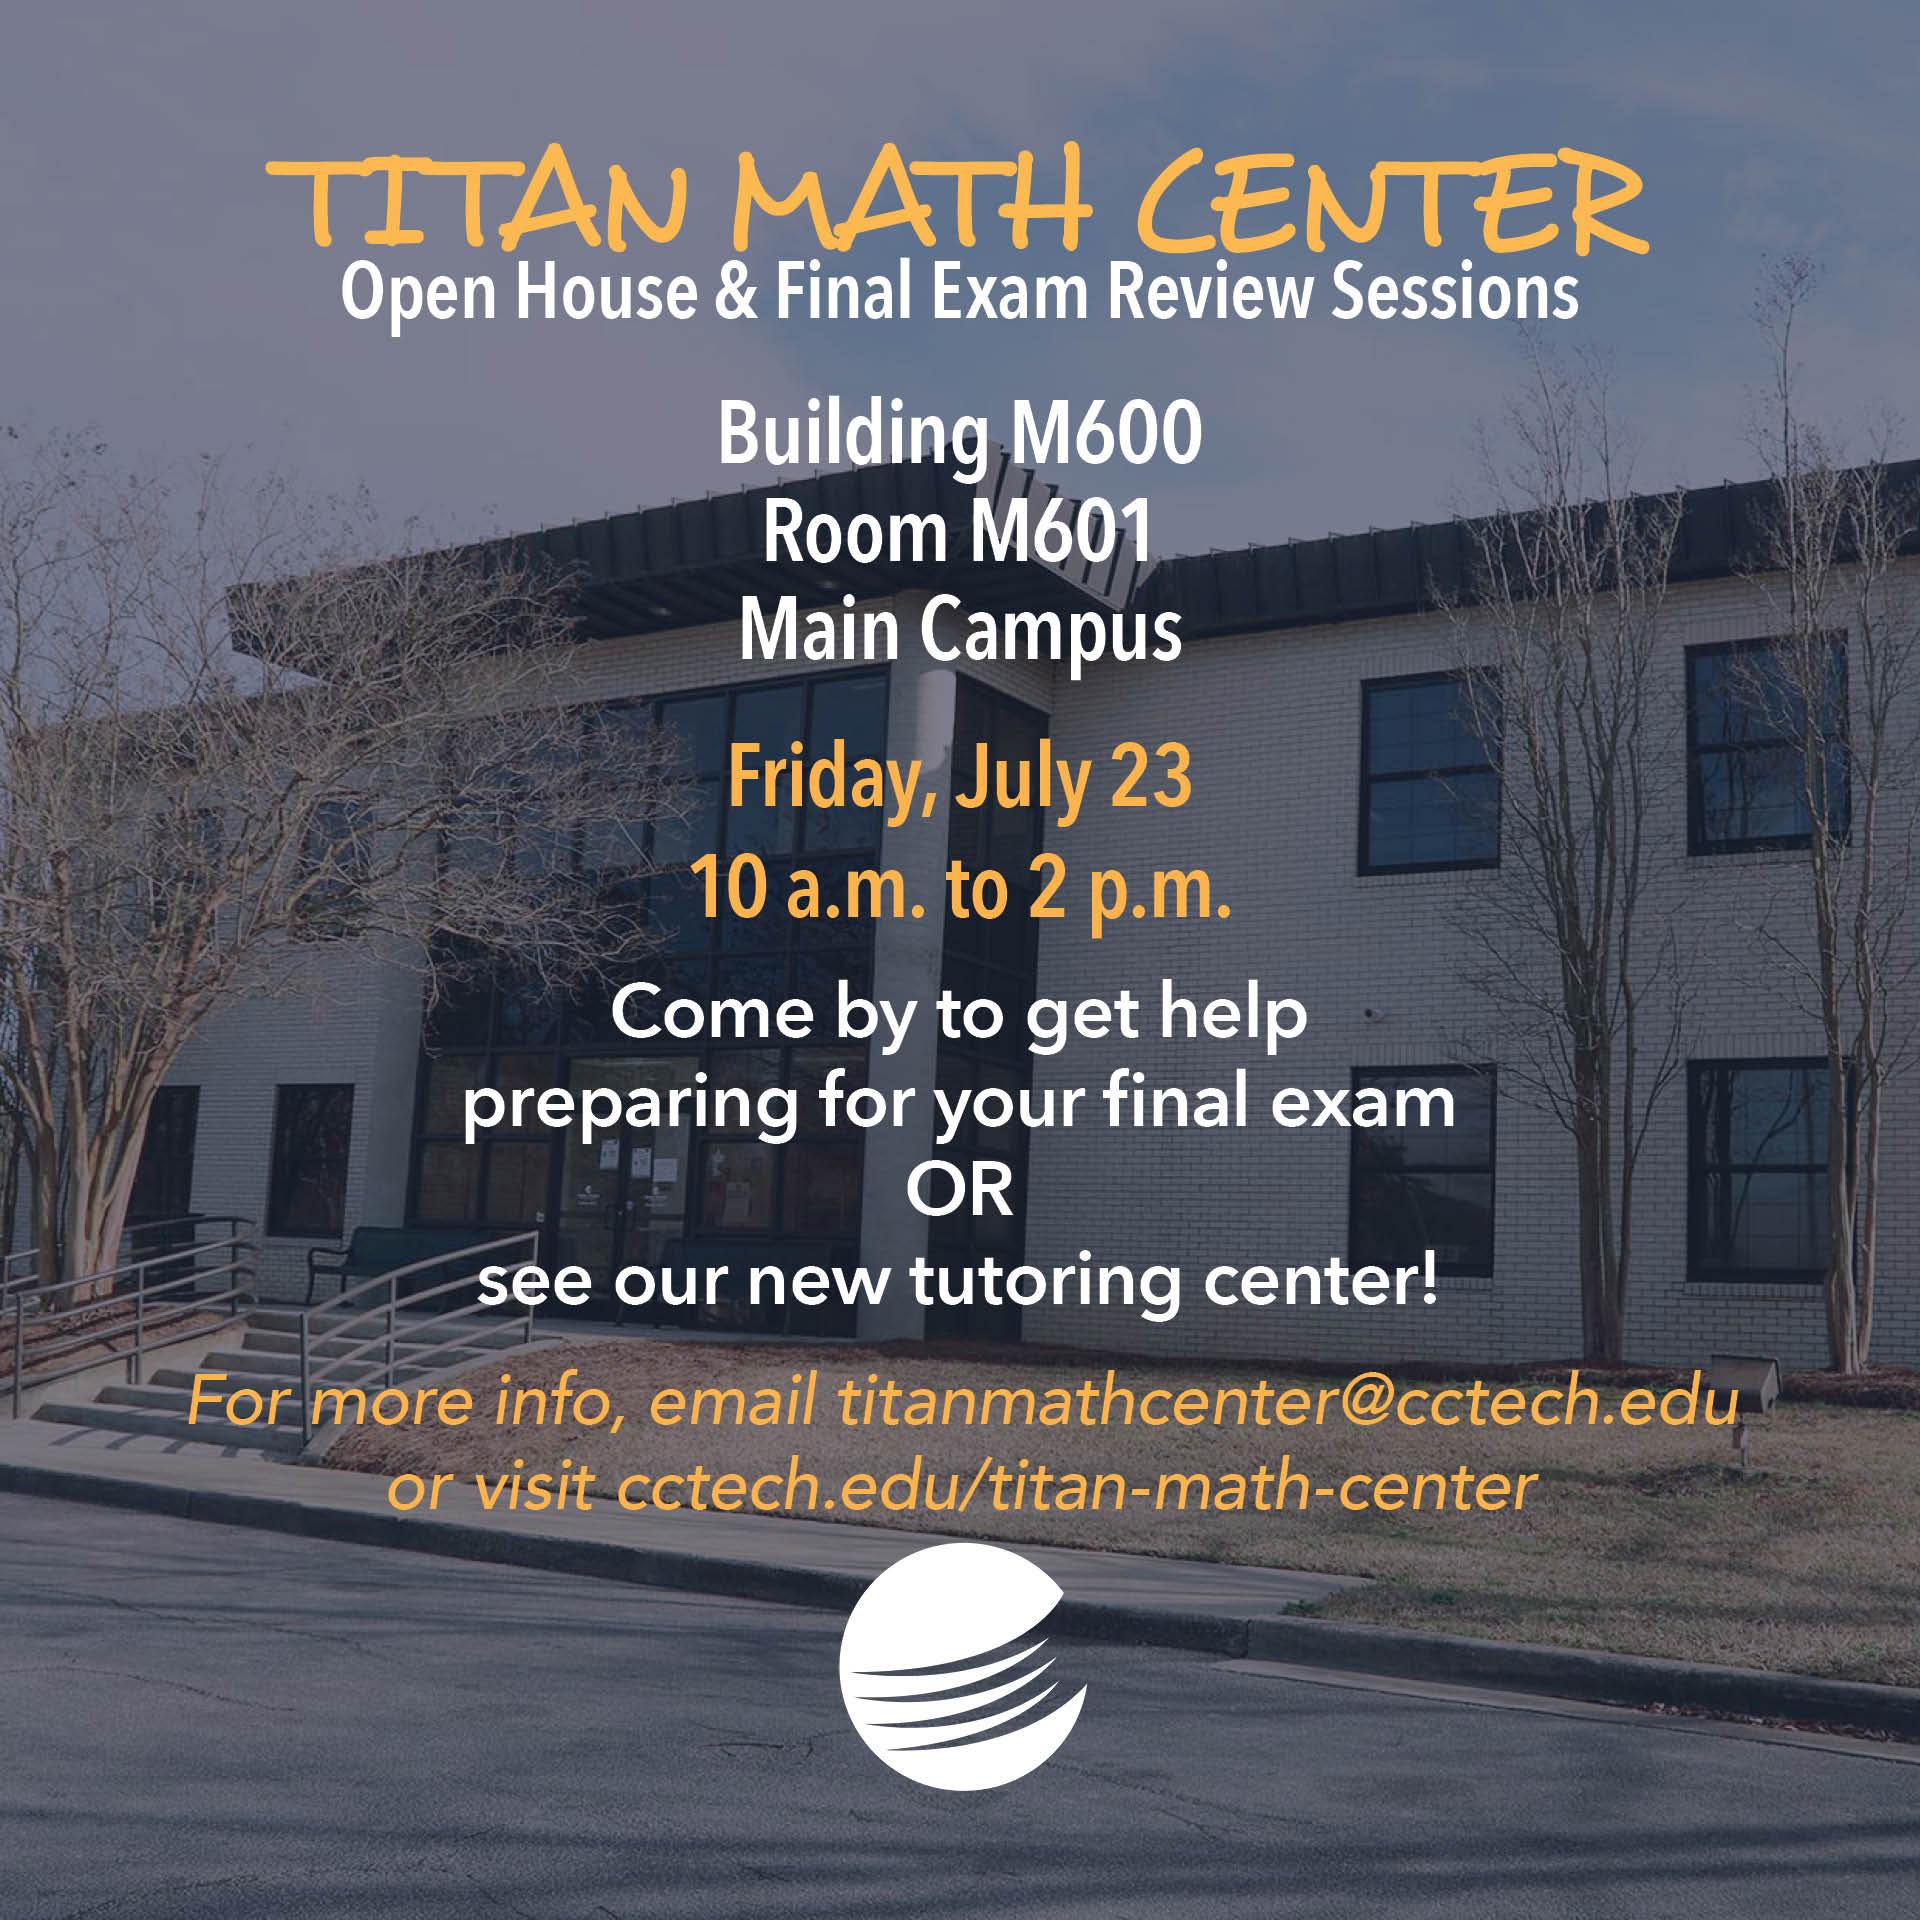 Titan Math Center